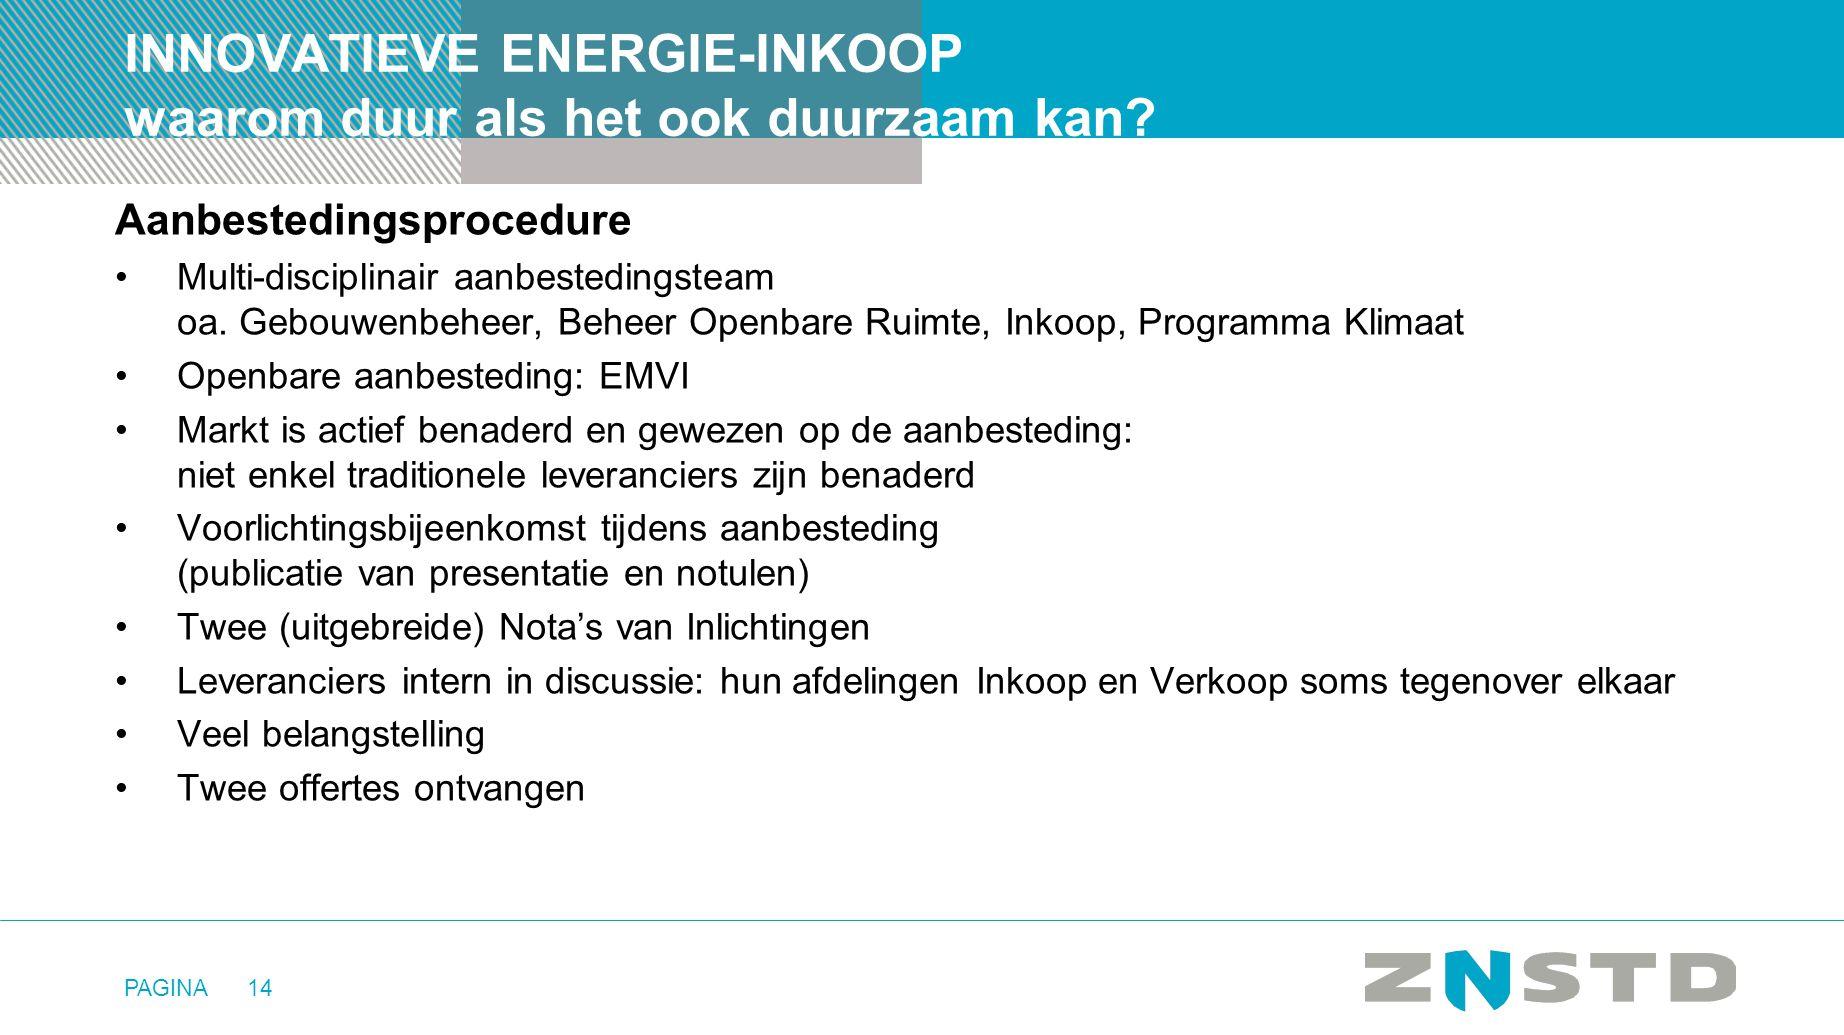 PAGINA14 INNOVATIEVE ENERGIE-INKOOP waarom duur als het ook duurzaam kan? Aanbestedingsprocedure •Multi-disciplinair aanbestedingsteam oa. Gebouwenbeh